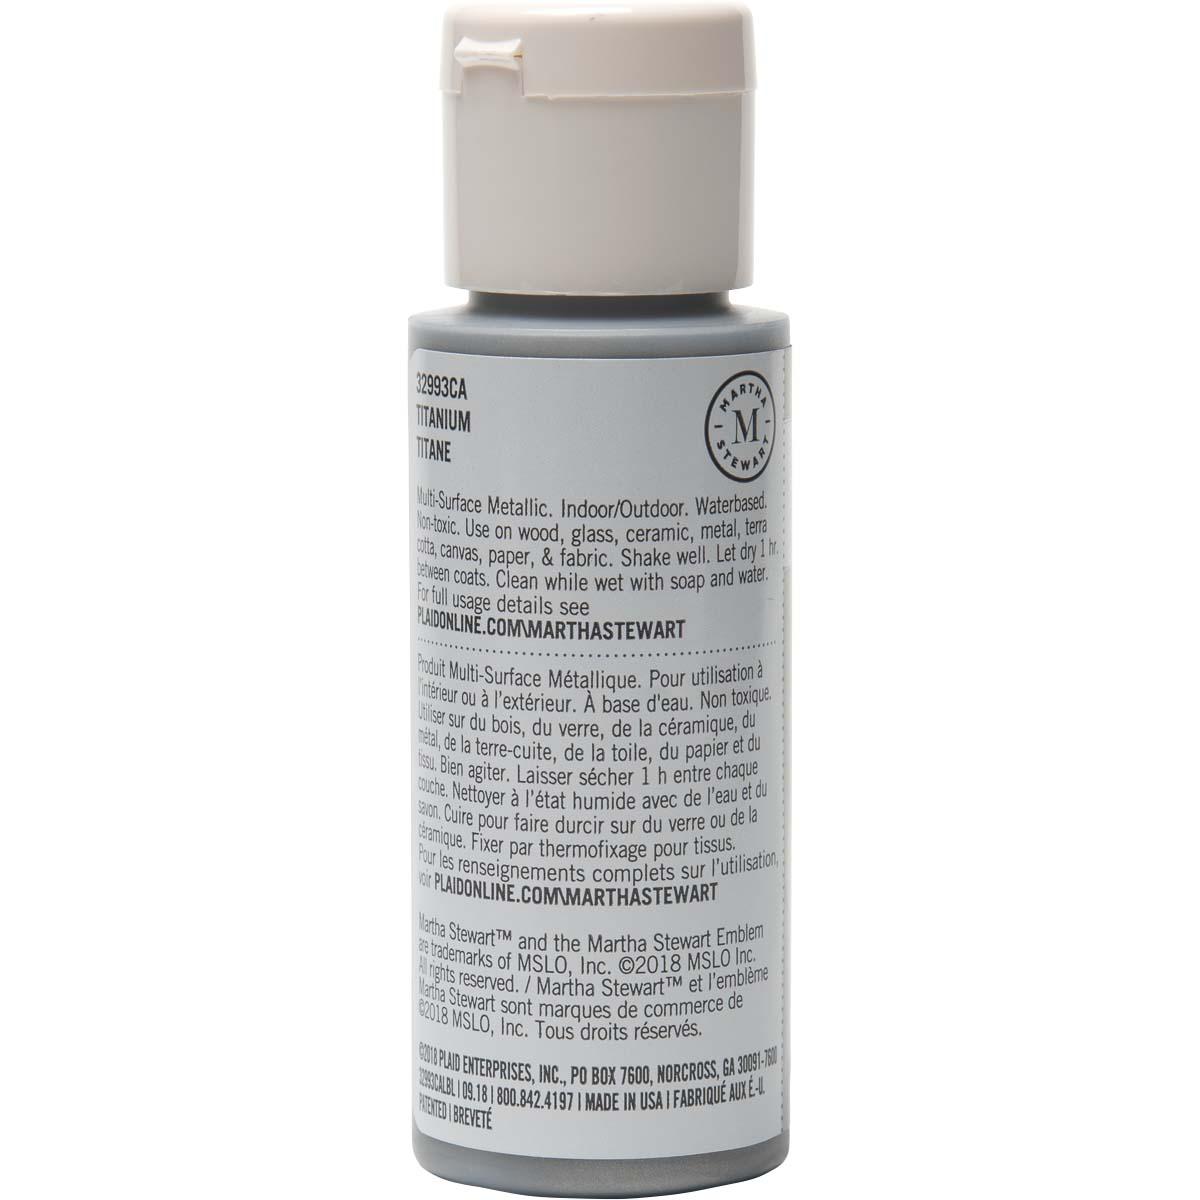 Martha Stewart ® Multi-Surface Metallic Acrylic Craft Paint - Titanium, 2 oz.